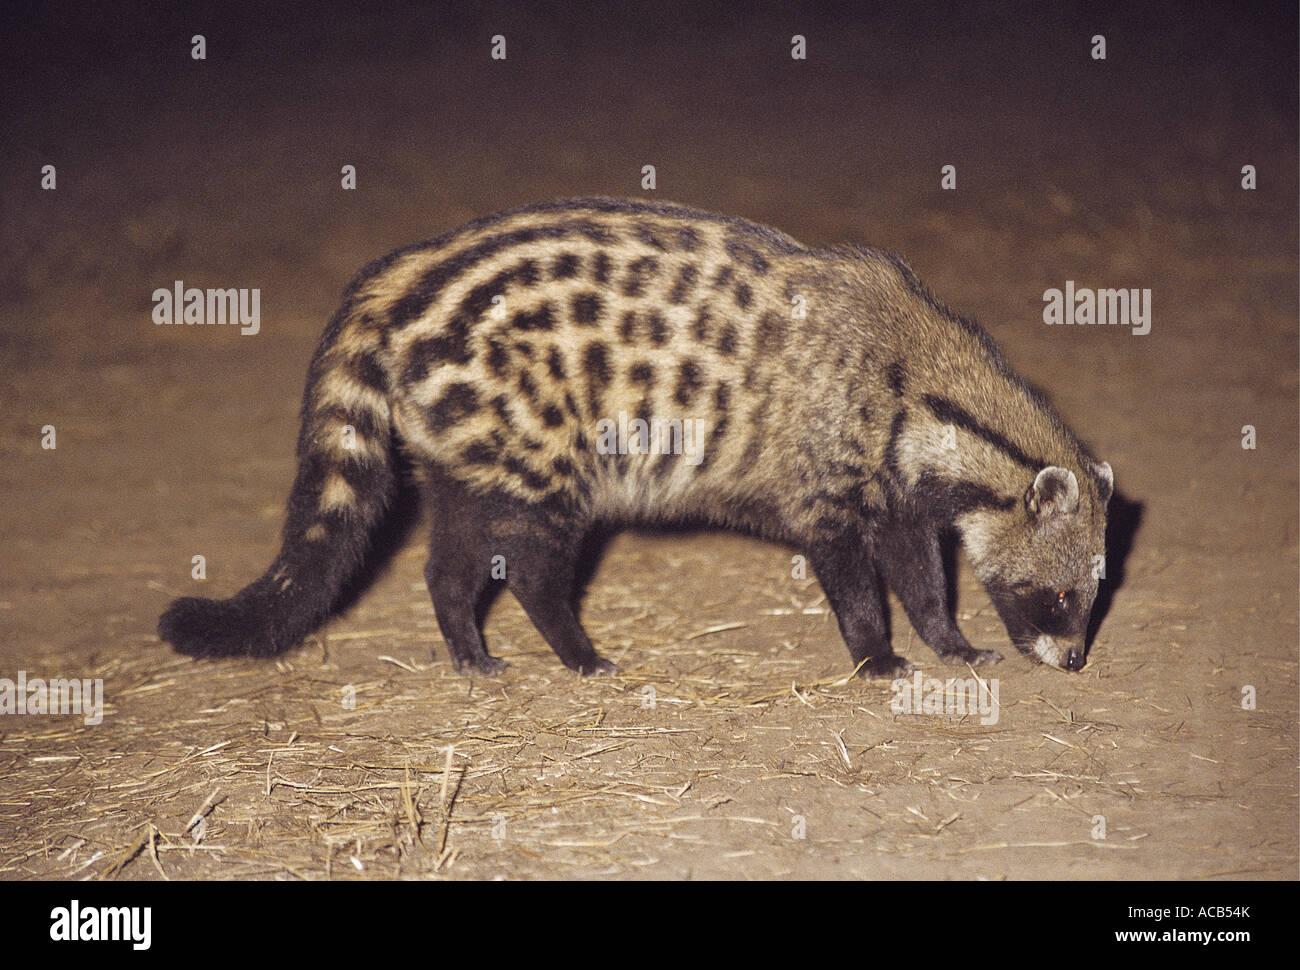 Civet taken at nightime South Luangwa National Park Zambia - Stock Image